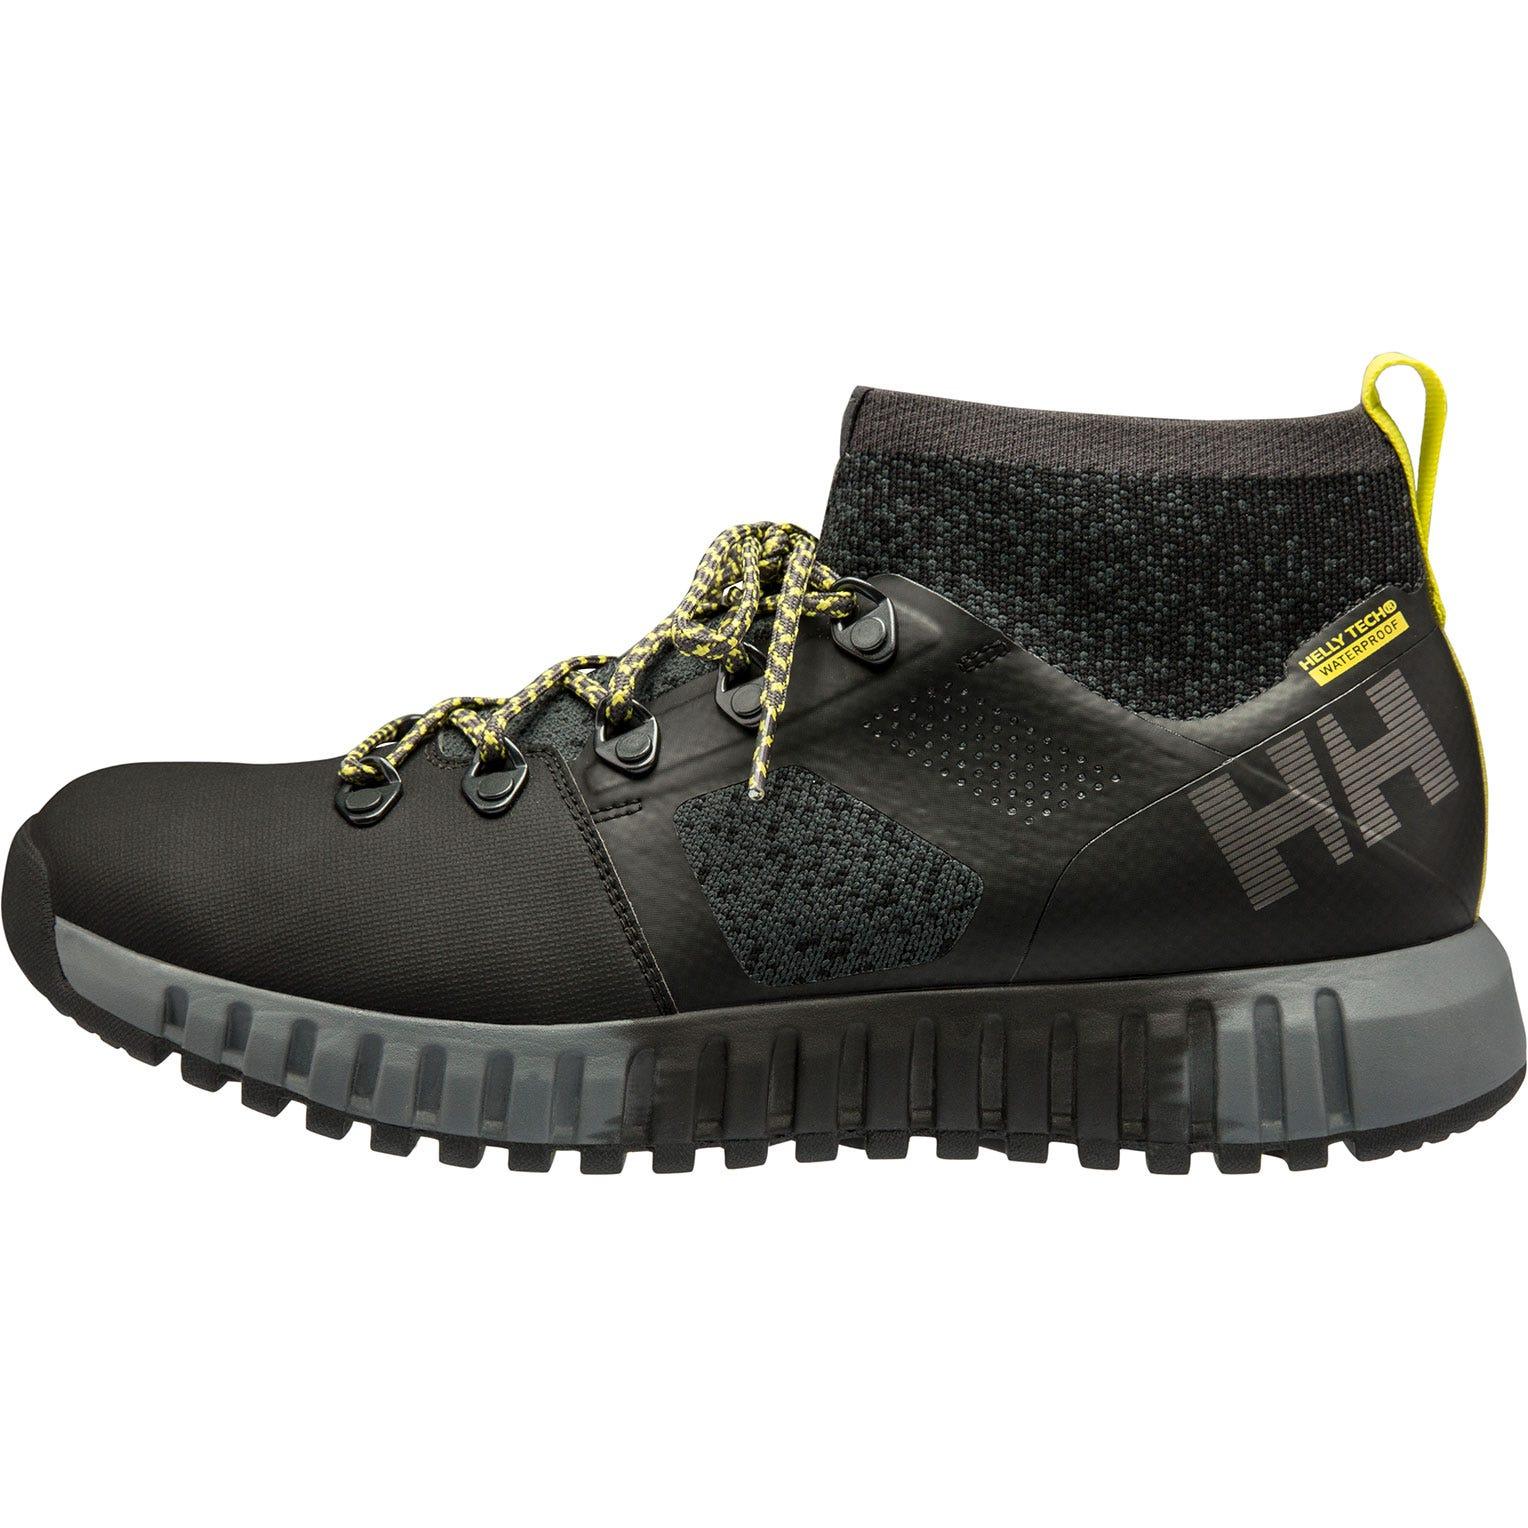 Helly Hansen Vanir Canter Ht Mens Hiking Boot Black 43/9.5